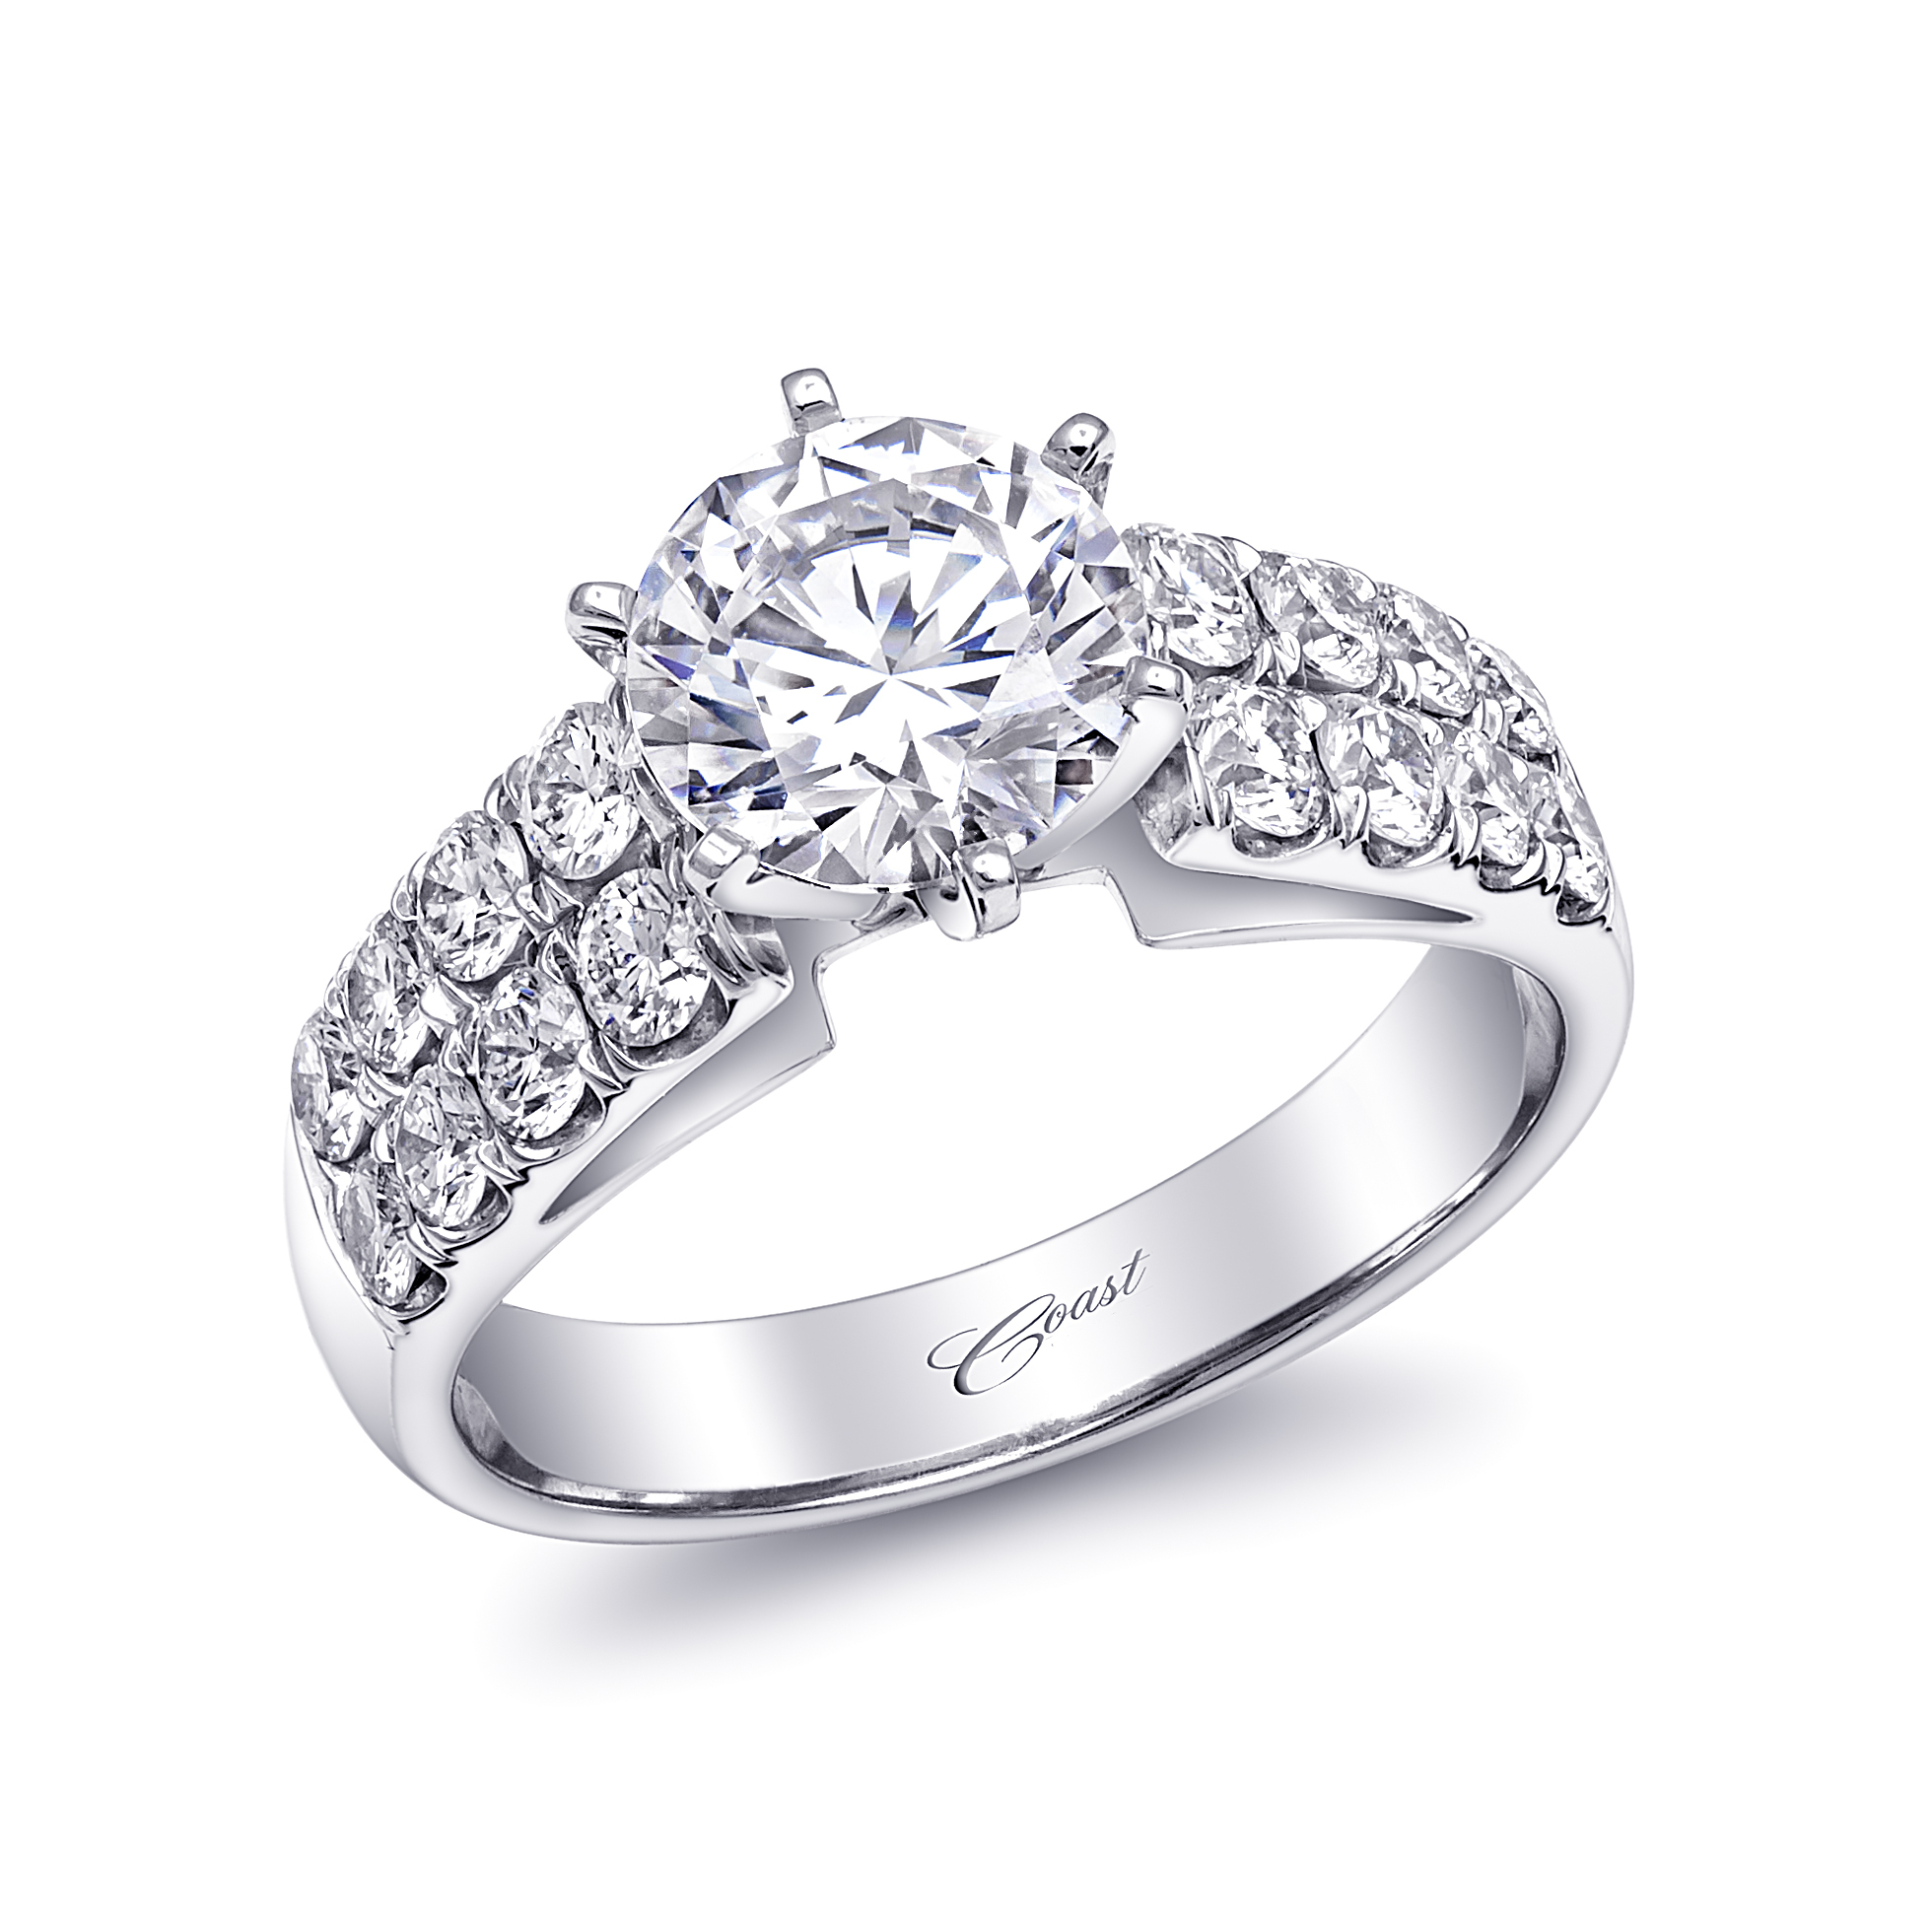 Charisma Engagement Ring - Double Row Diamond Shank